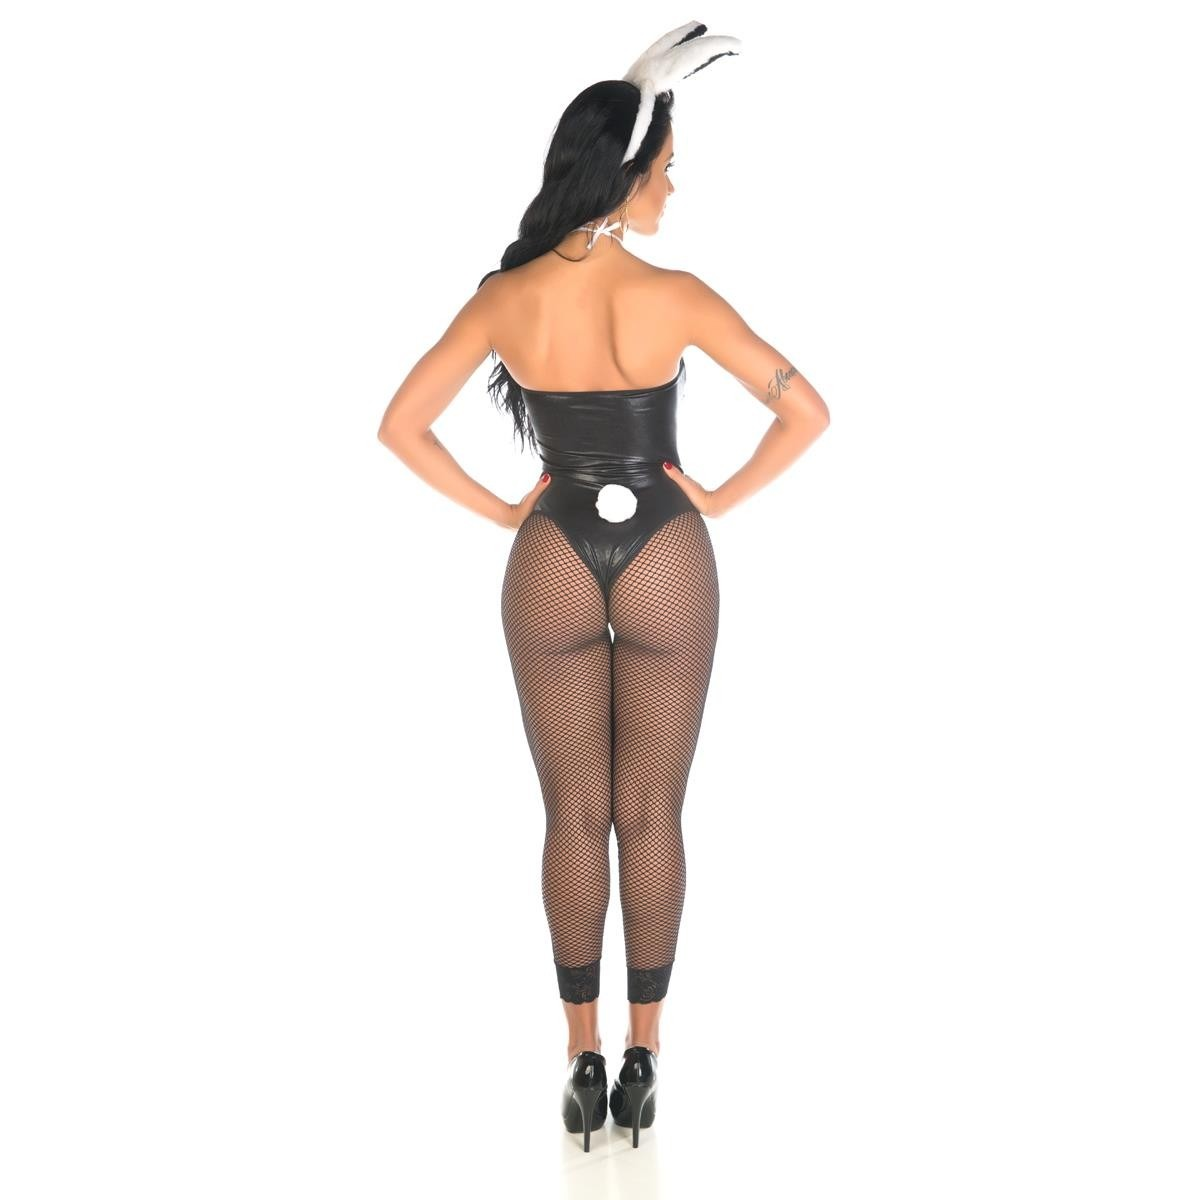 Amazonfr : Playboy - Lingerie / Femme : Vtements